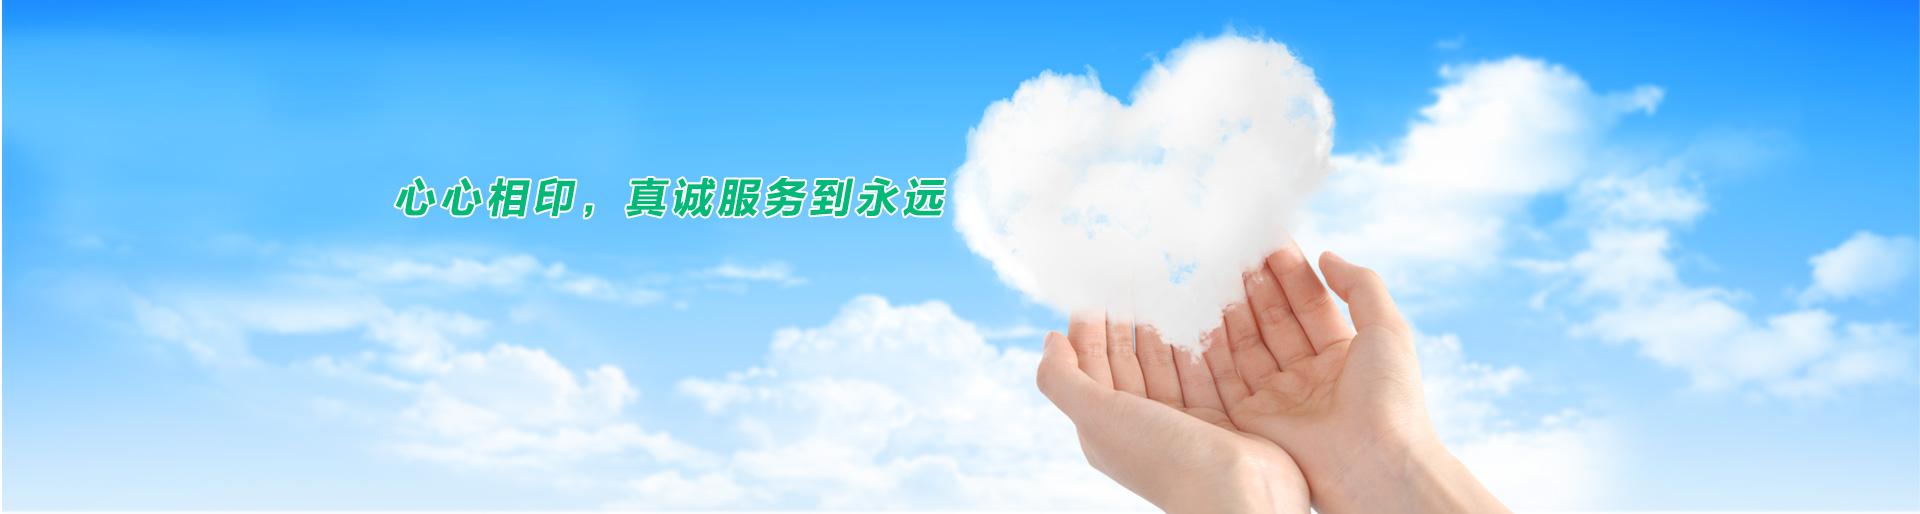 18luck新利官网下载集团